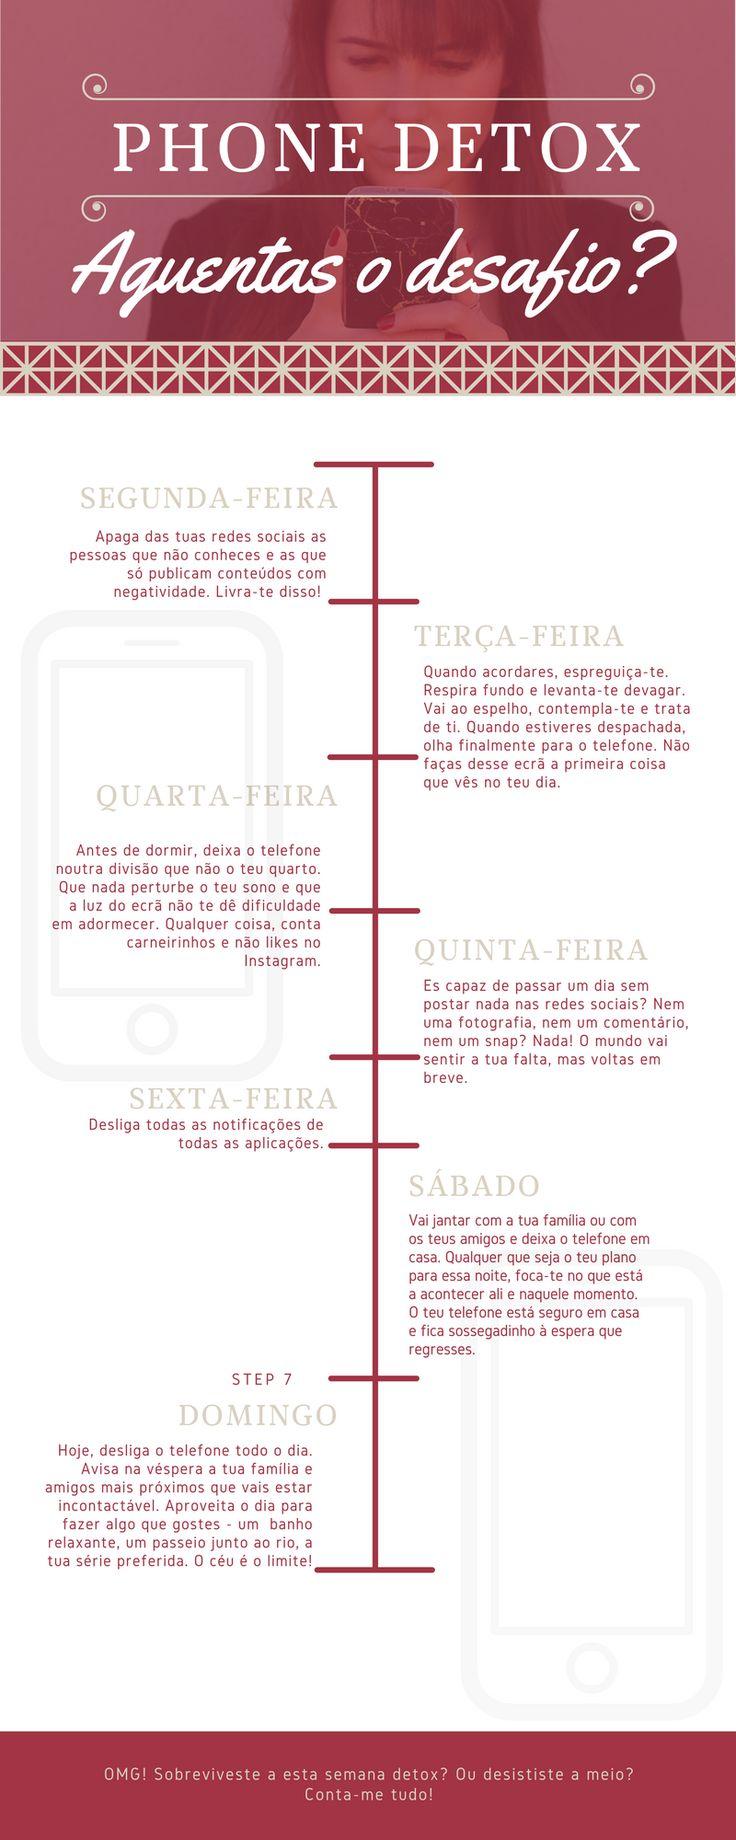 Phone Detox